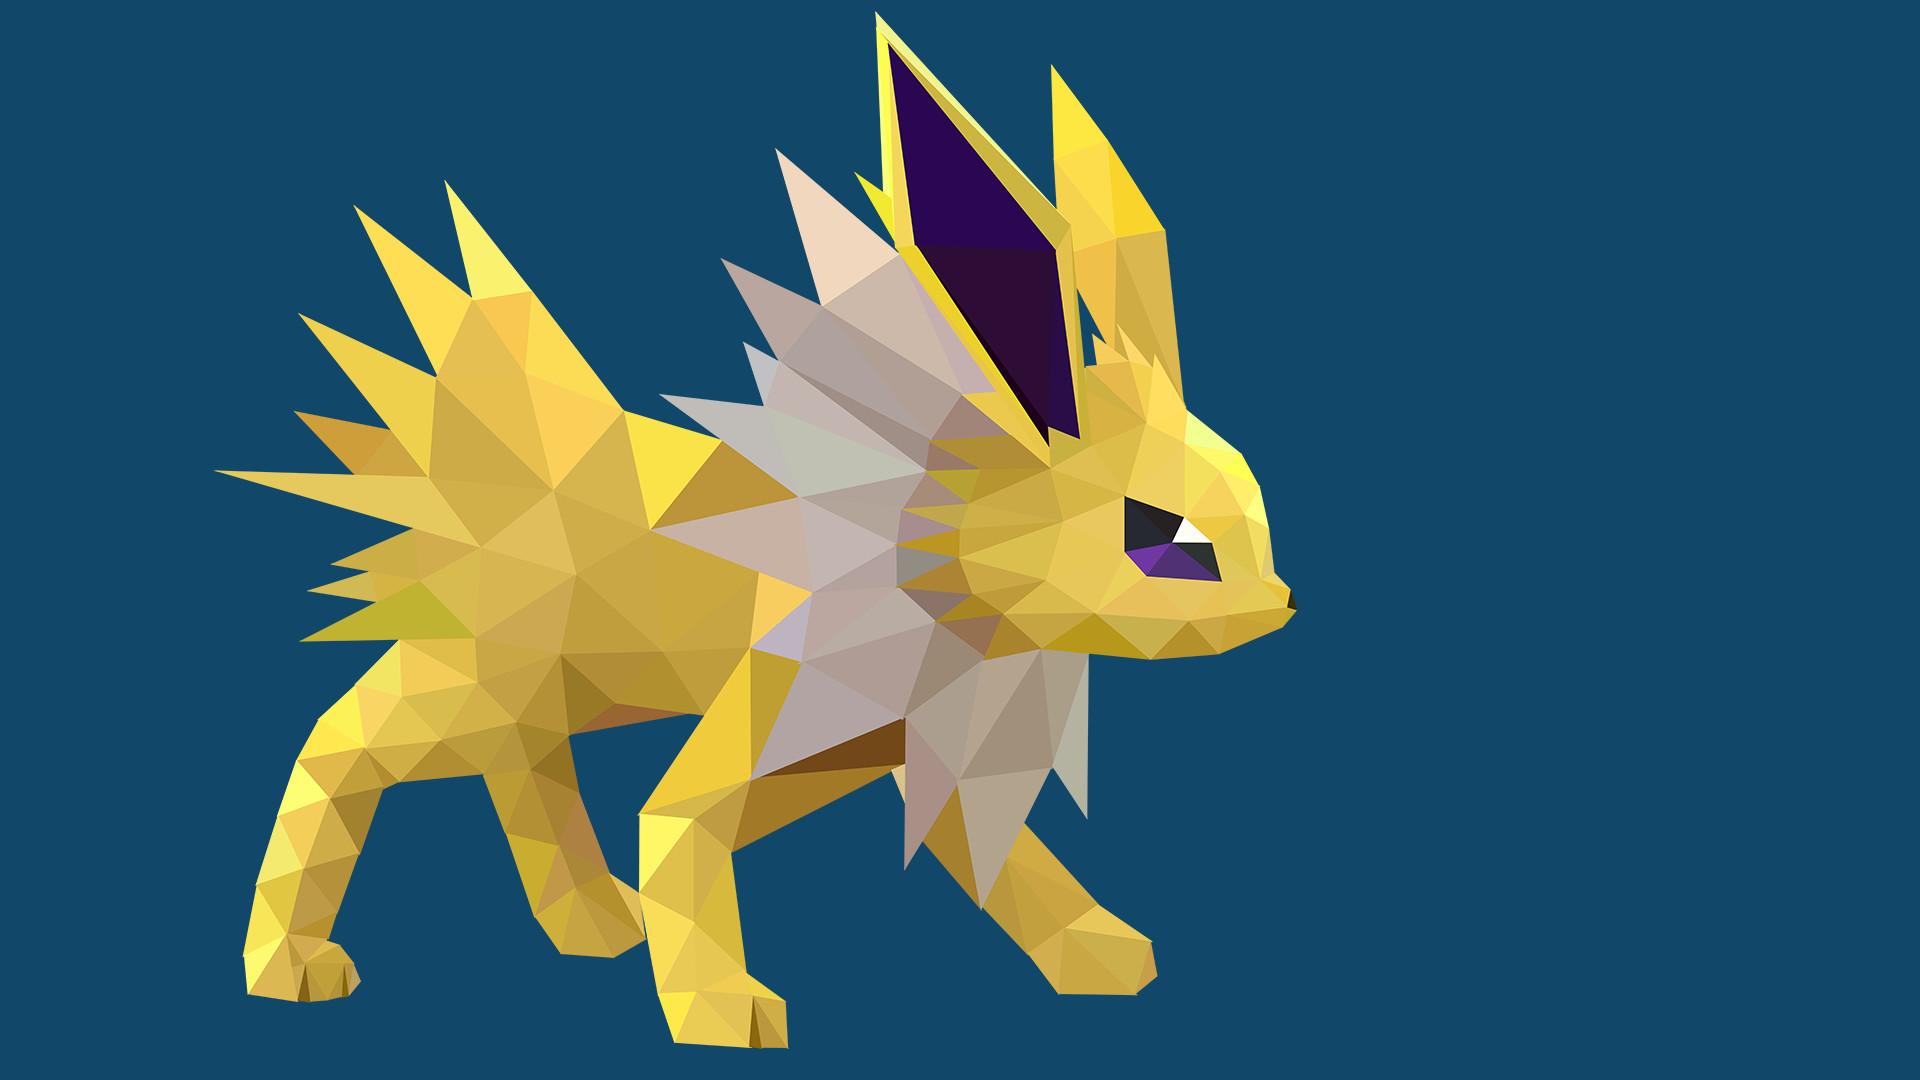 … Low-Poly Jolteon by pikachu-hat